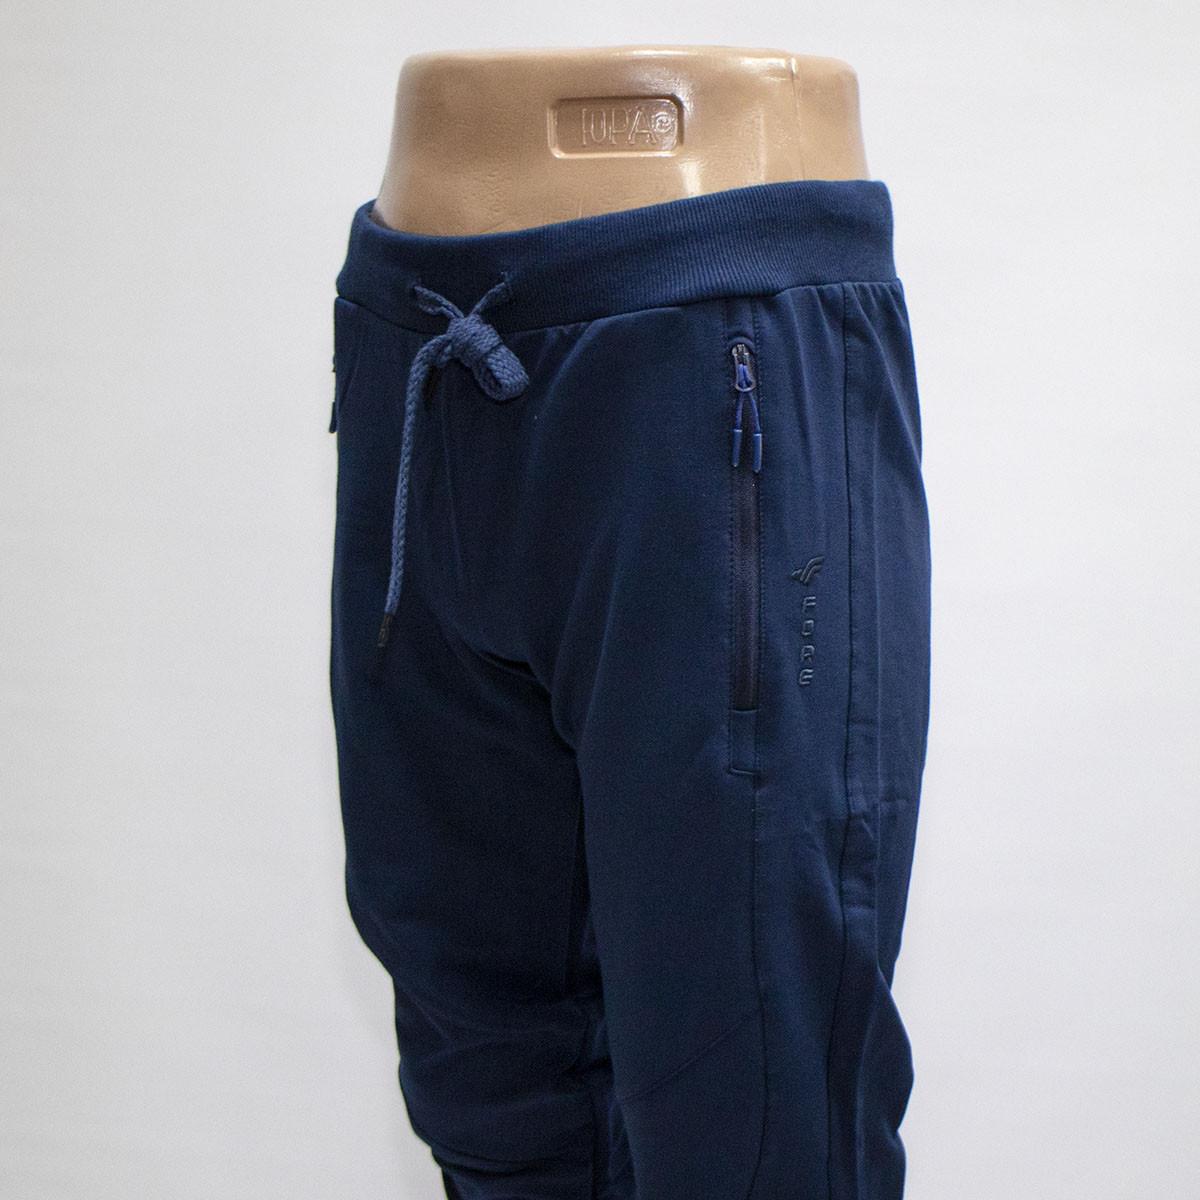 Мужские спортивные штаны на манжете фабрика Турция тм. FORE 9566N